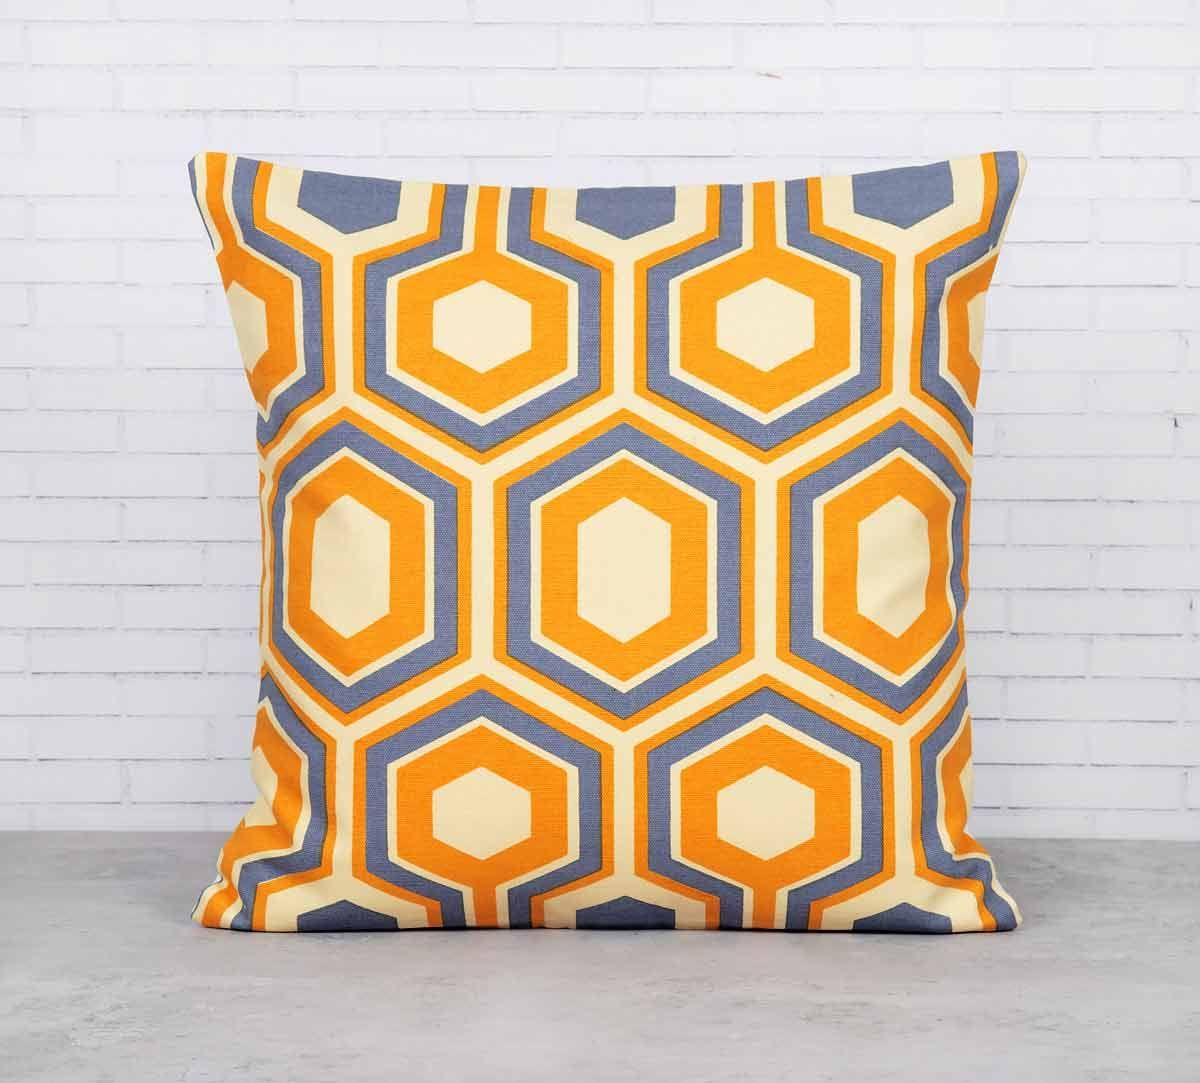 India Circus Prismatic Hexagons Lemon Cotton Cushion Cover